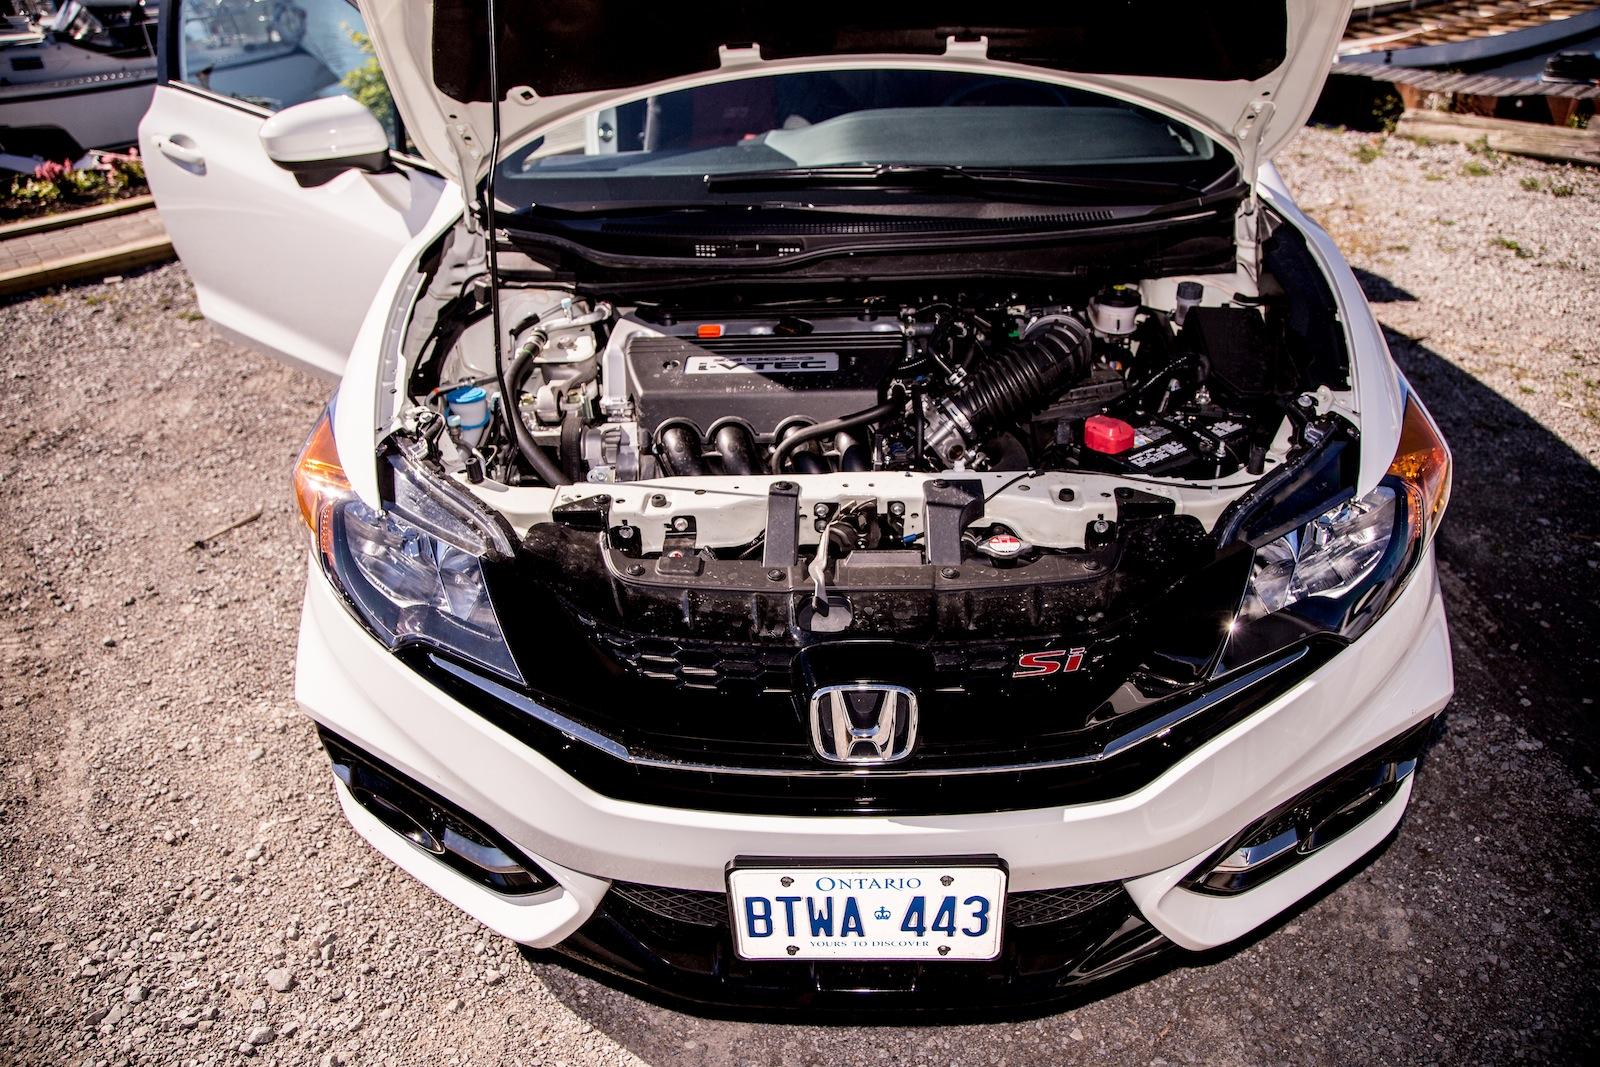 Honda 本田 Civic Si 與 Bmw 寶馬 228i 對比試車報告